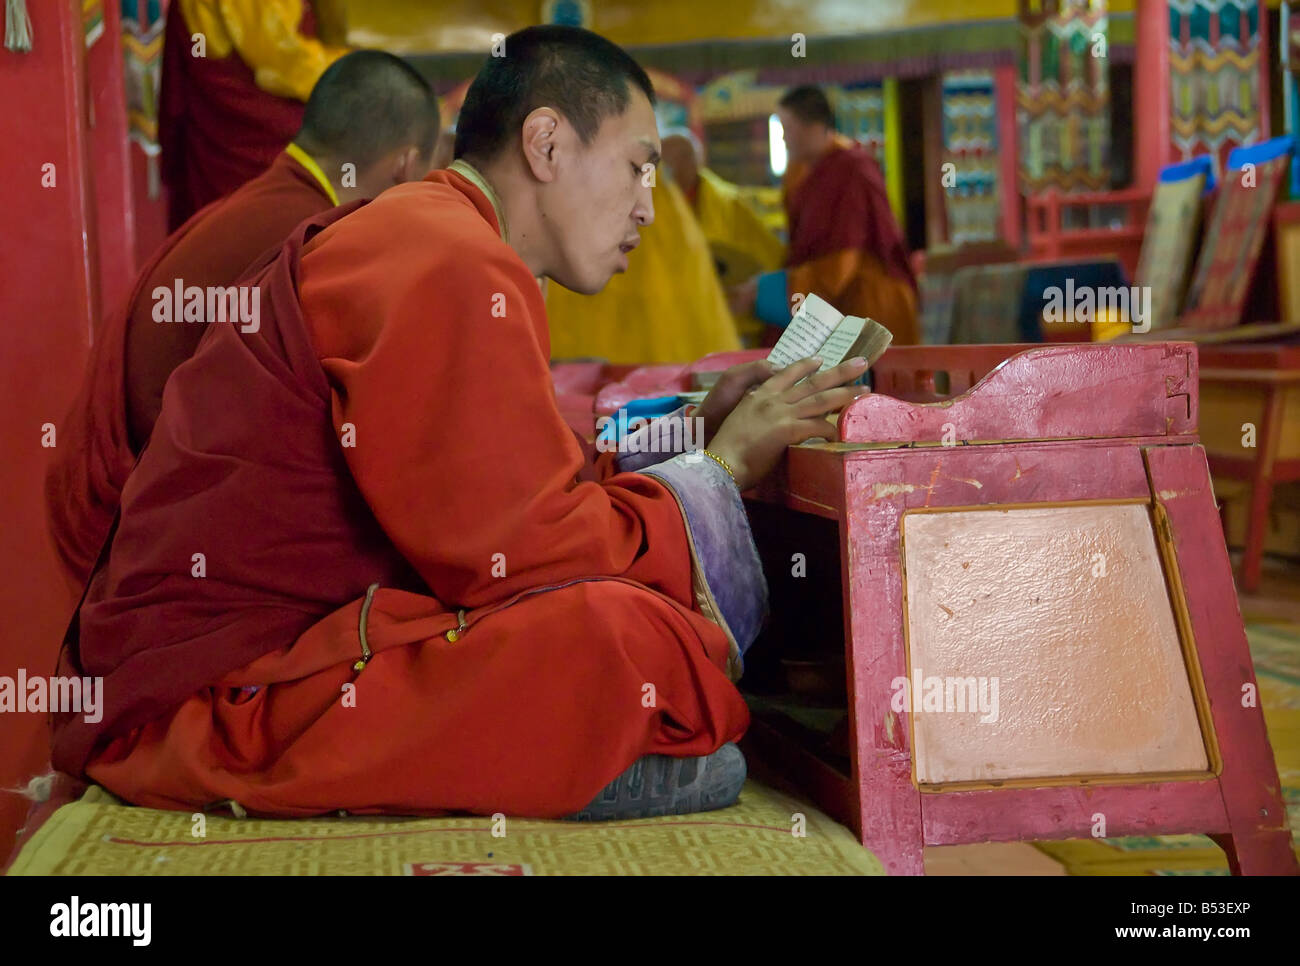 Buddhist Monk Reading their prayers at the Gandan Khiid Monastery UlaanBaatar Mongolia - Stock Image